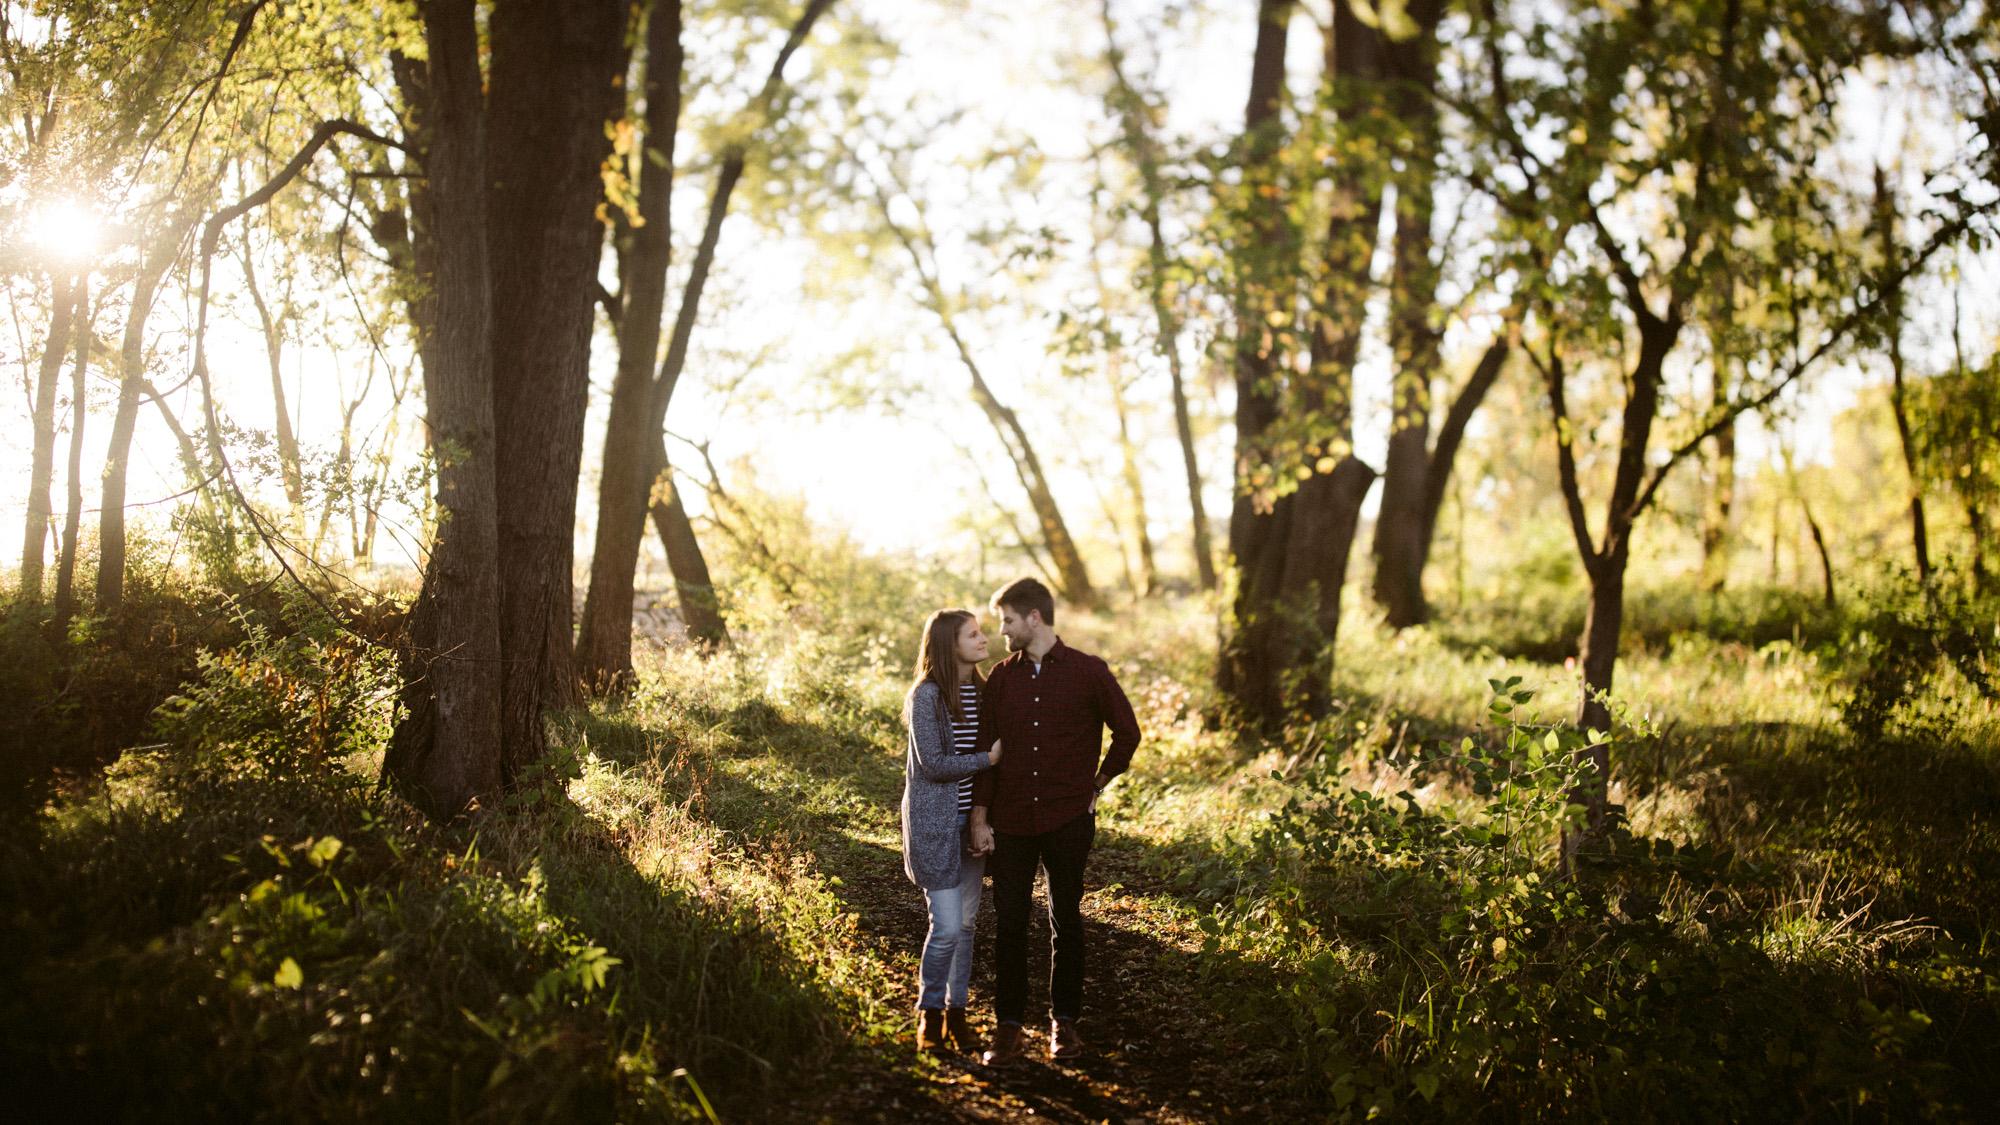 alec_vanderboom_Kansas_City_Engagement_Photos-0014.jpg